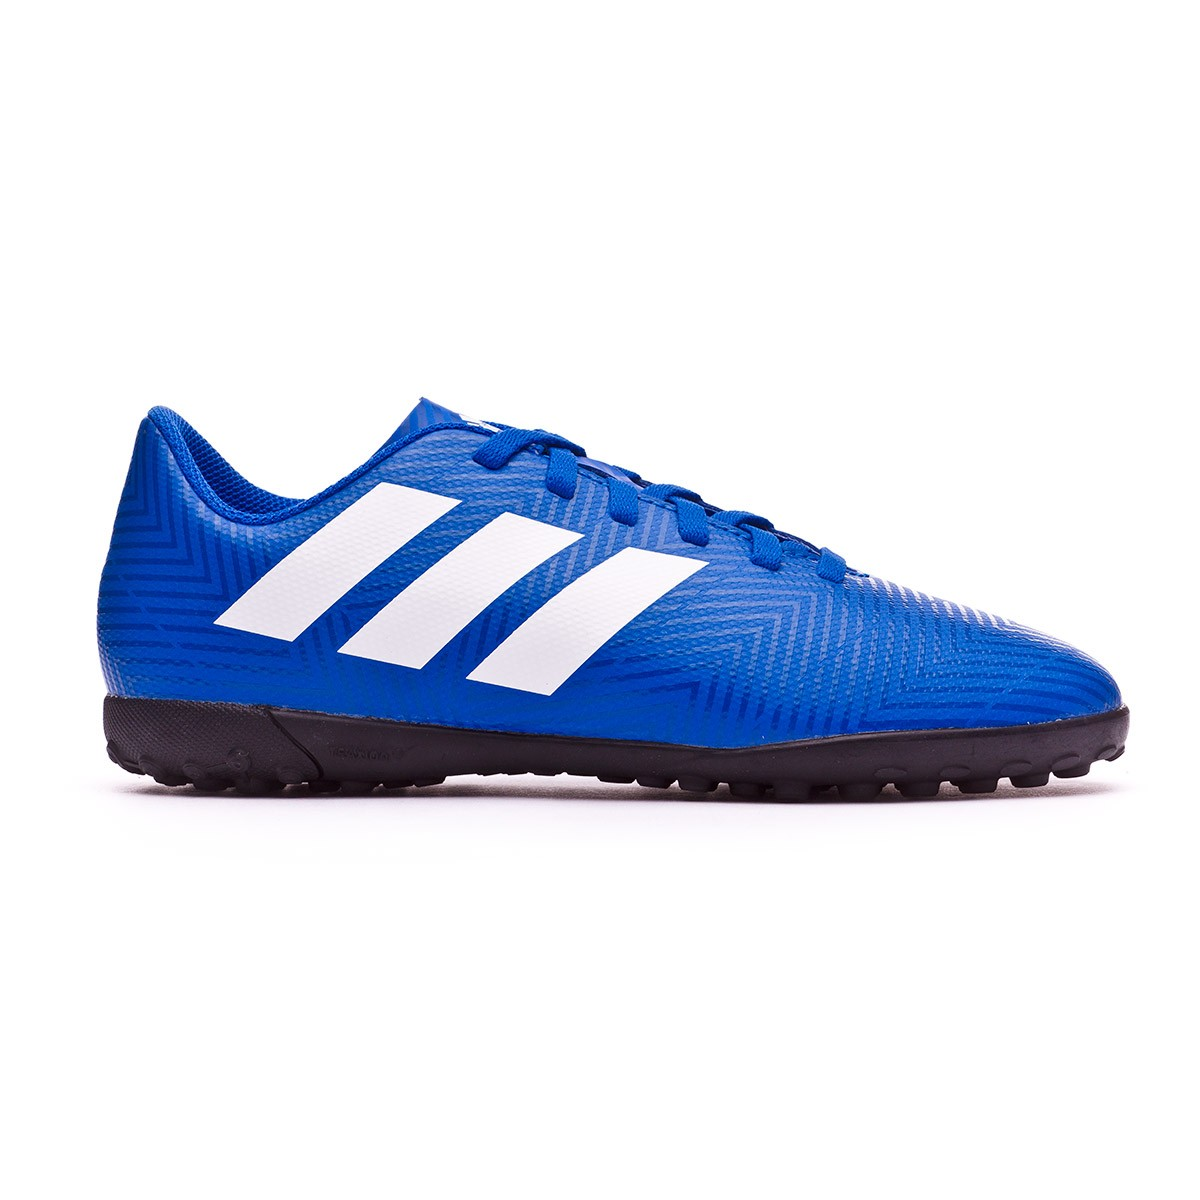 90831a7f1d8ff Tenis adidas Nemeziz Tango 18.4 Turf Niño Football blue-White-Football blue  - Tienda de fútbol Fútbol Emotion